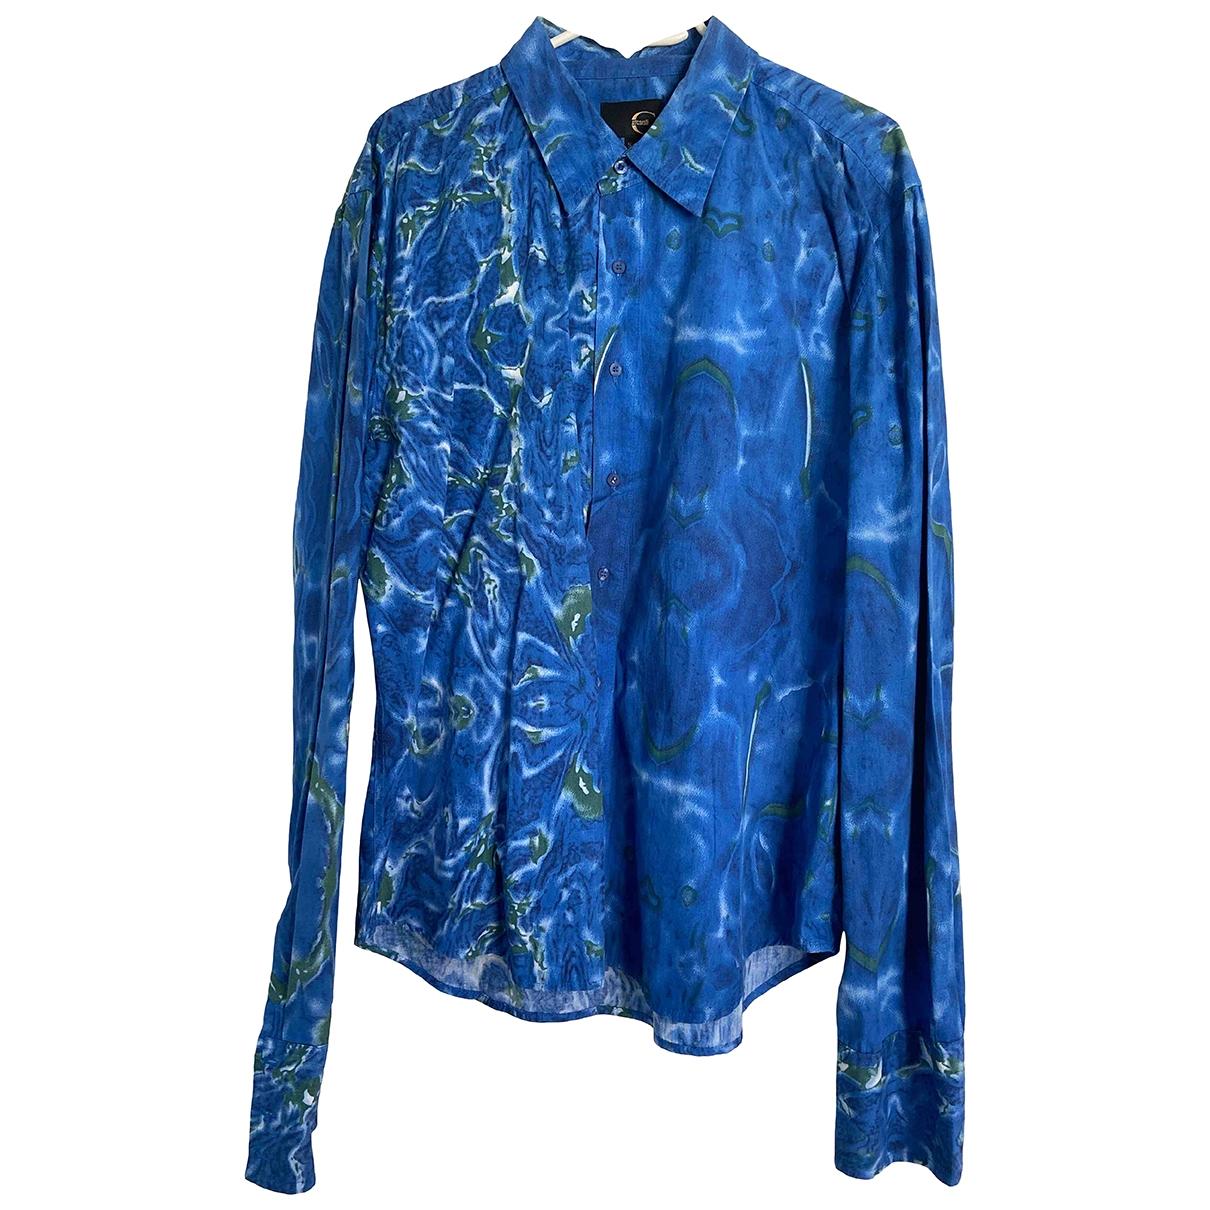 Just Cavalli \N Blue Cotton Shirts for Men XL International